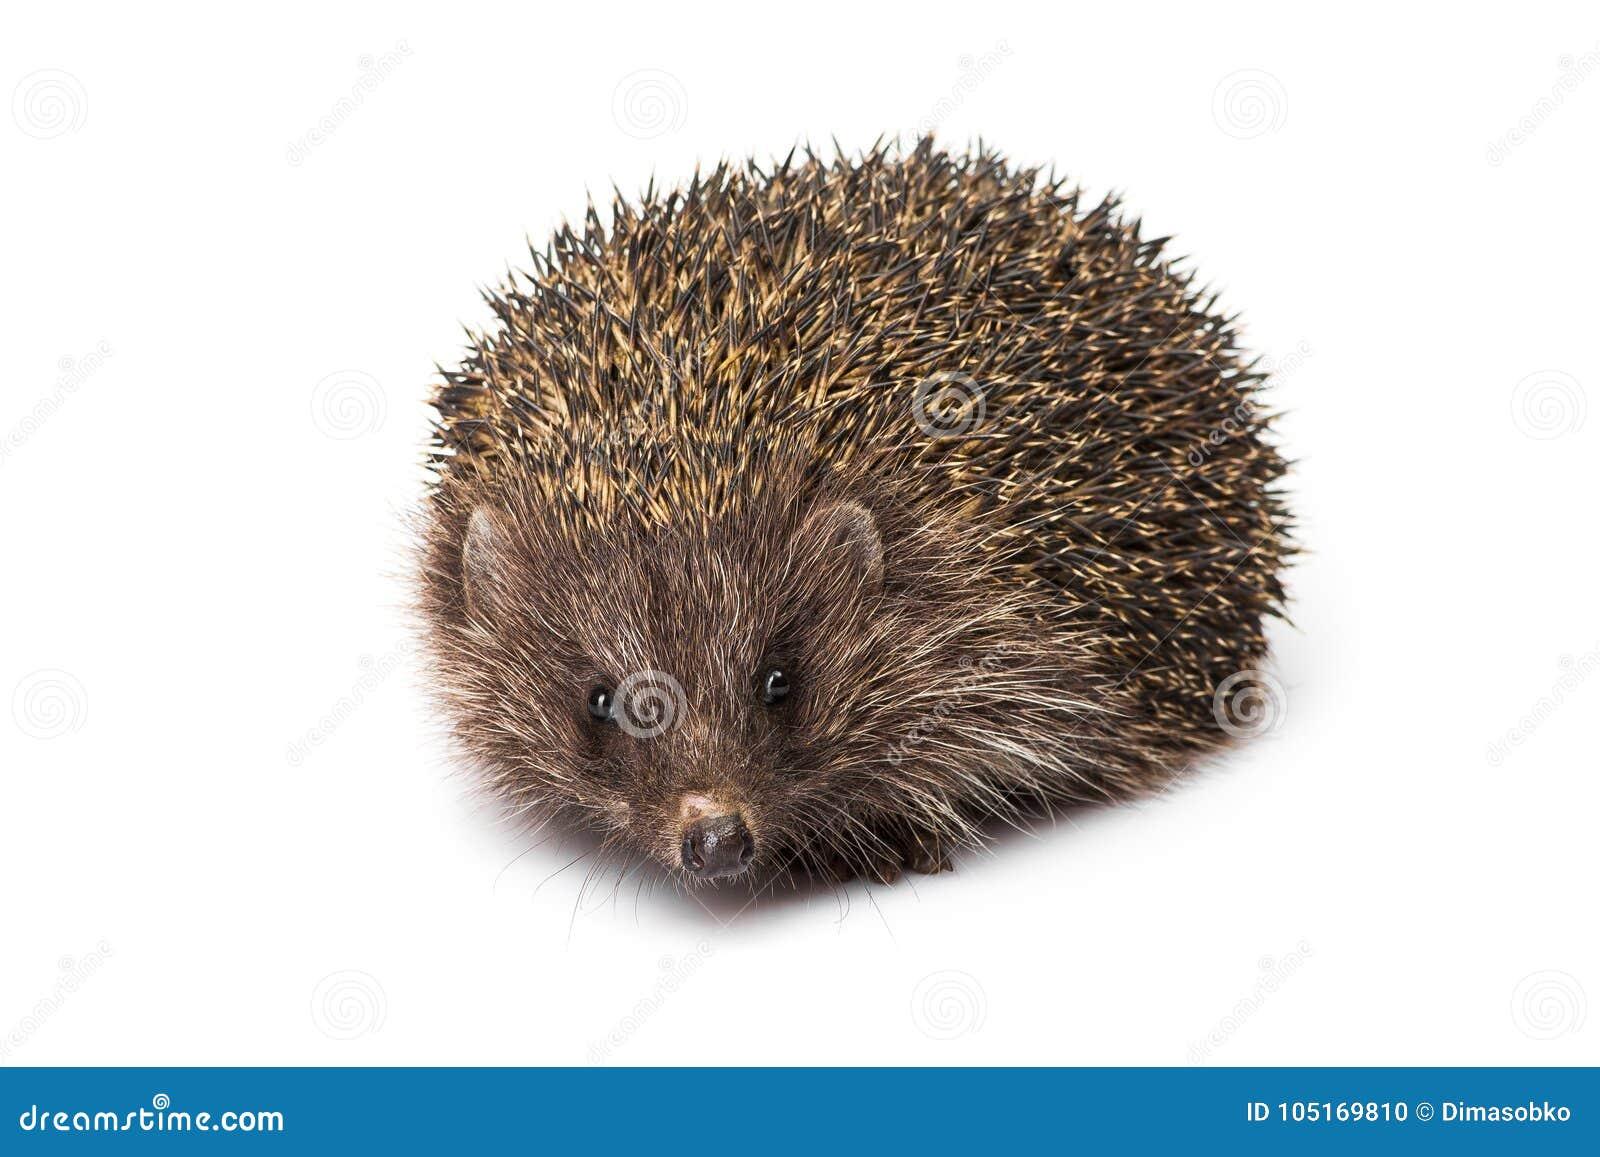 Ouriço animal pequeno isolado